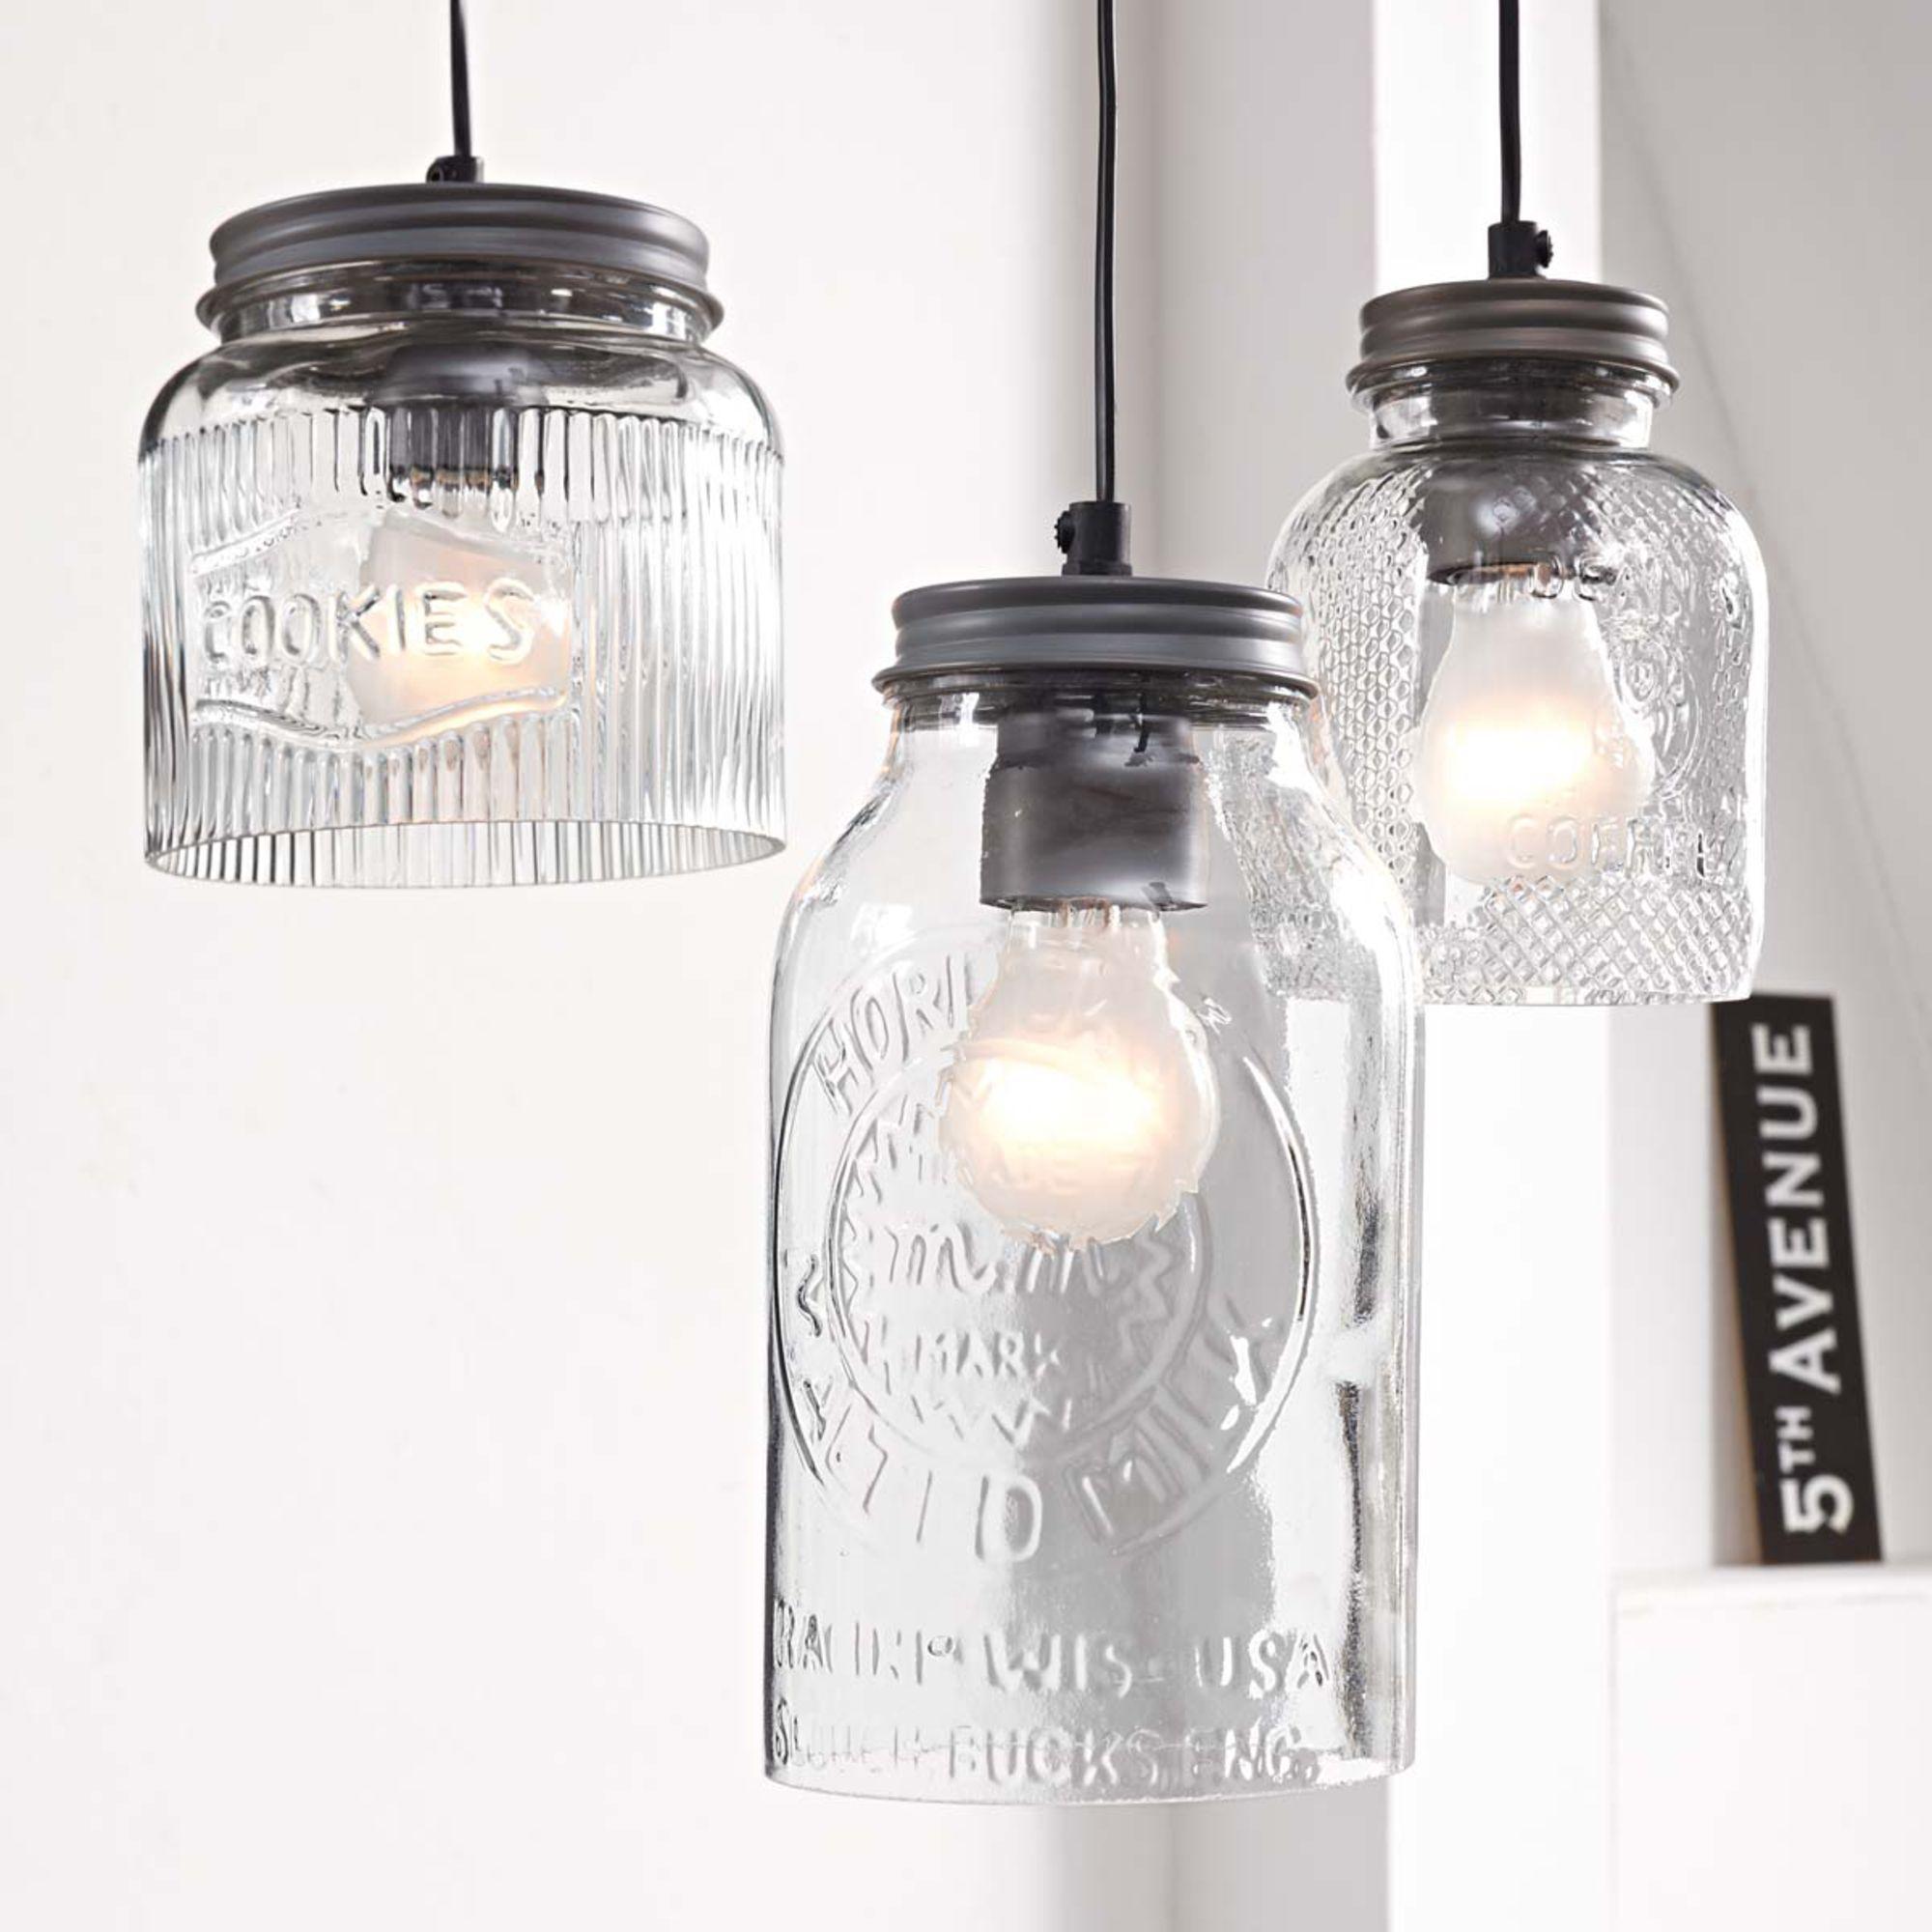 Inspiration Mason Jars Embossed Mason Jar Pendant Lamps Deckenleuchten Schone Lampen Glas